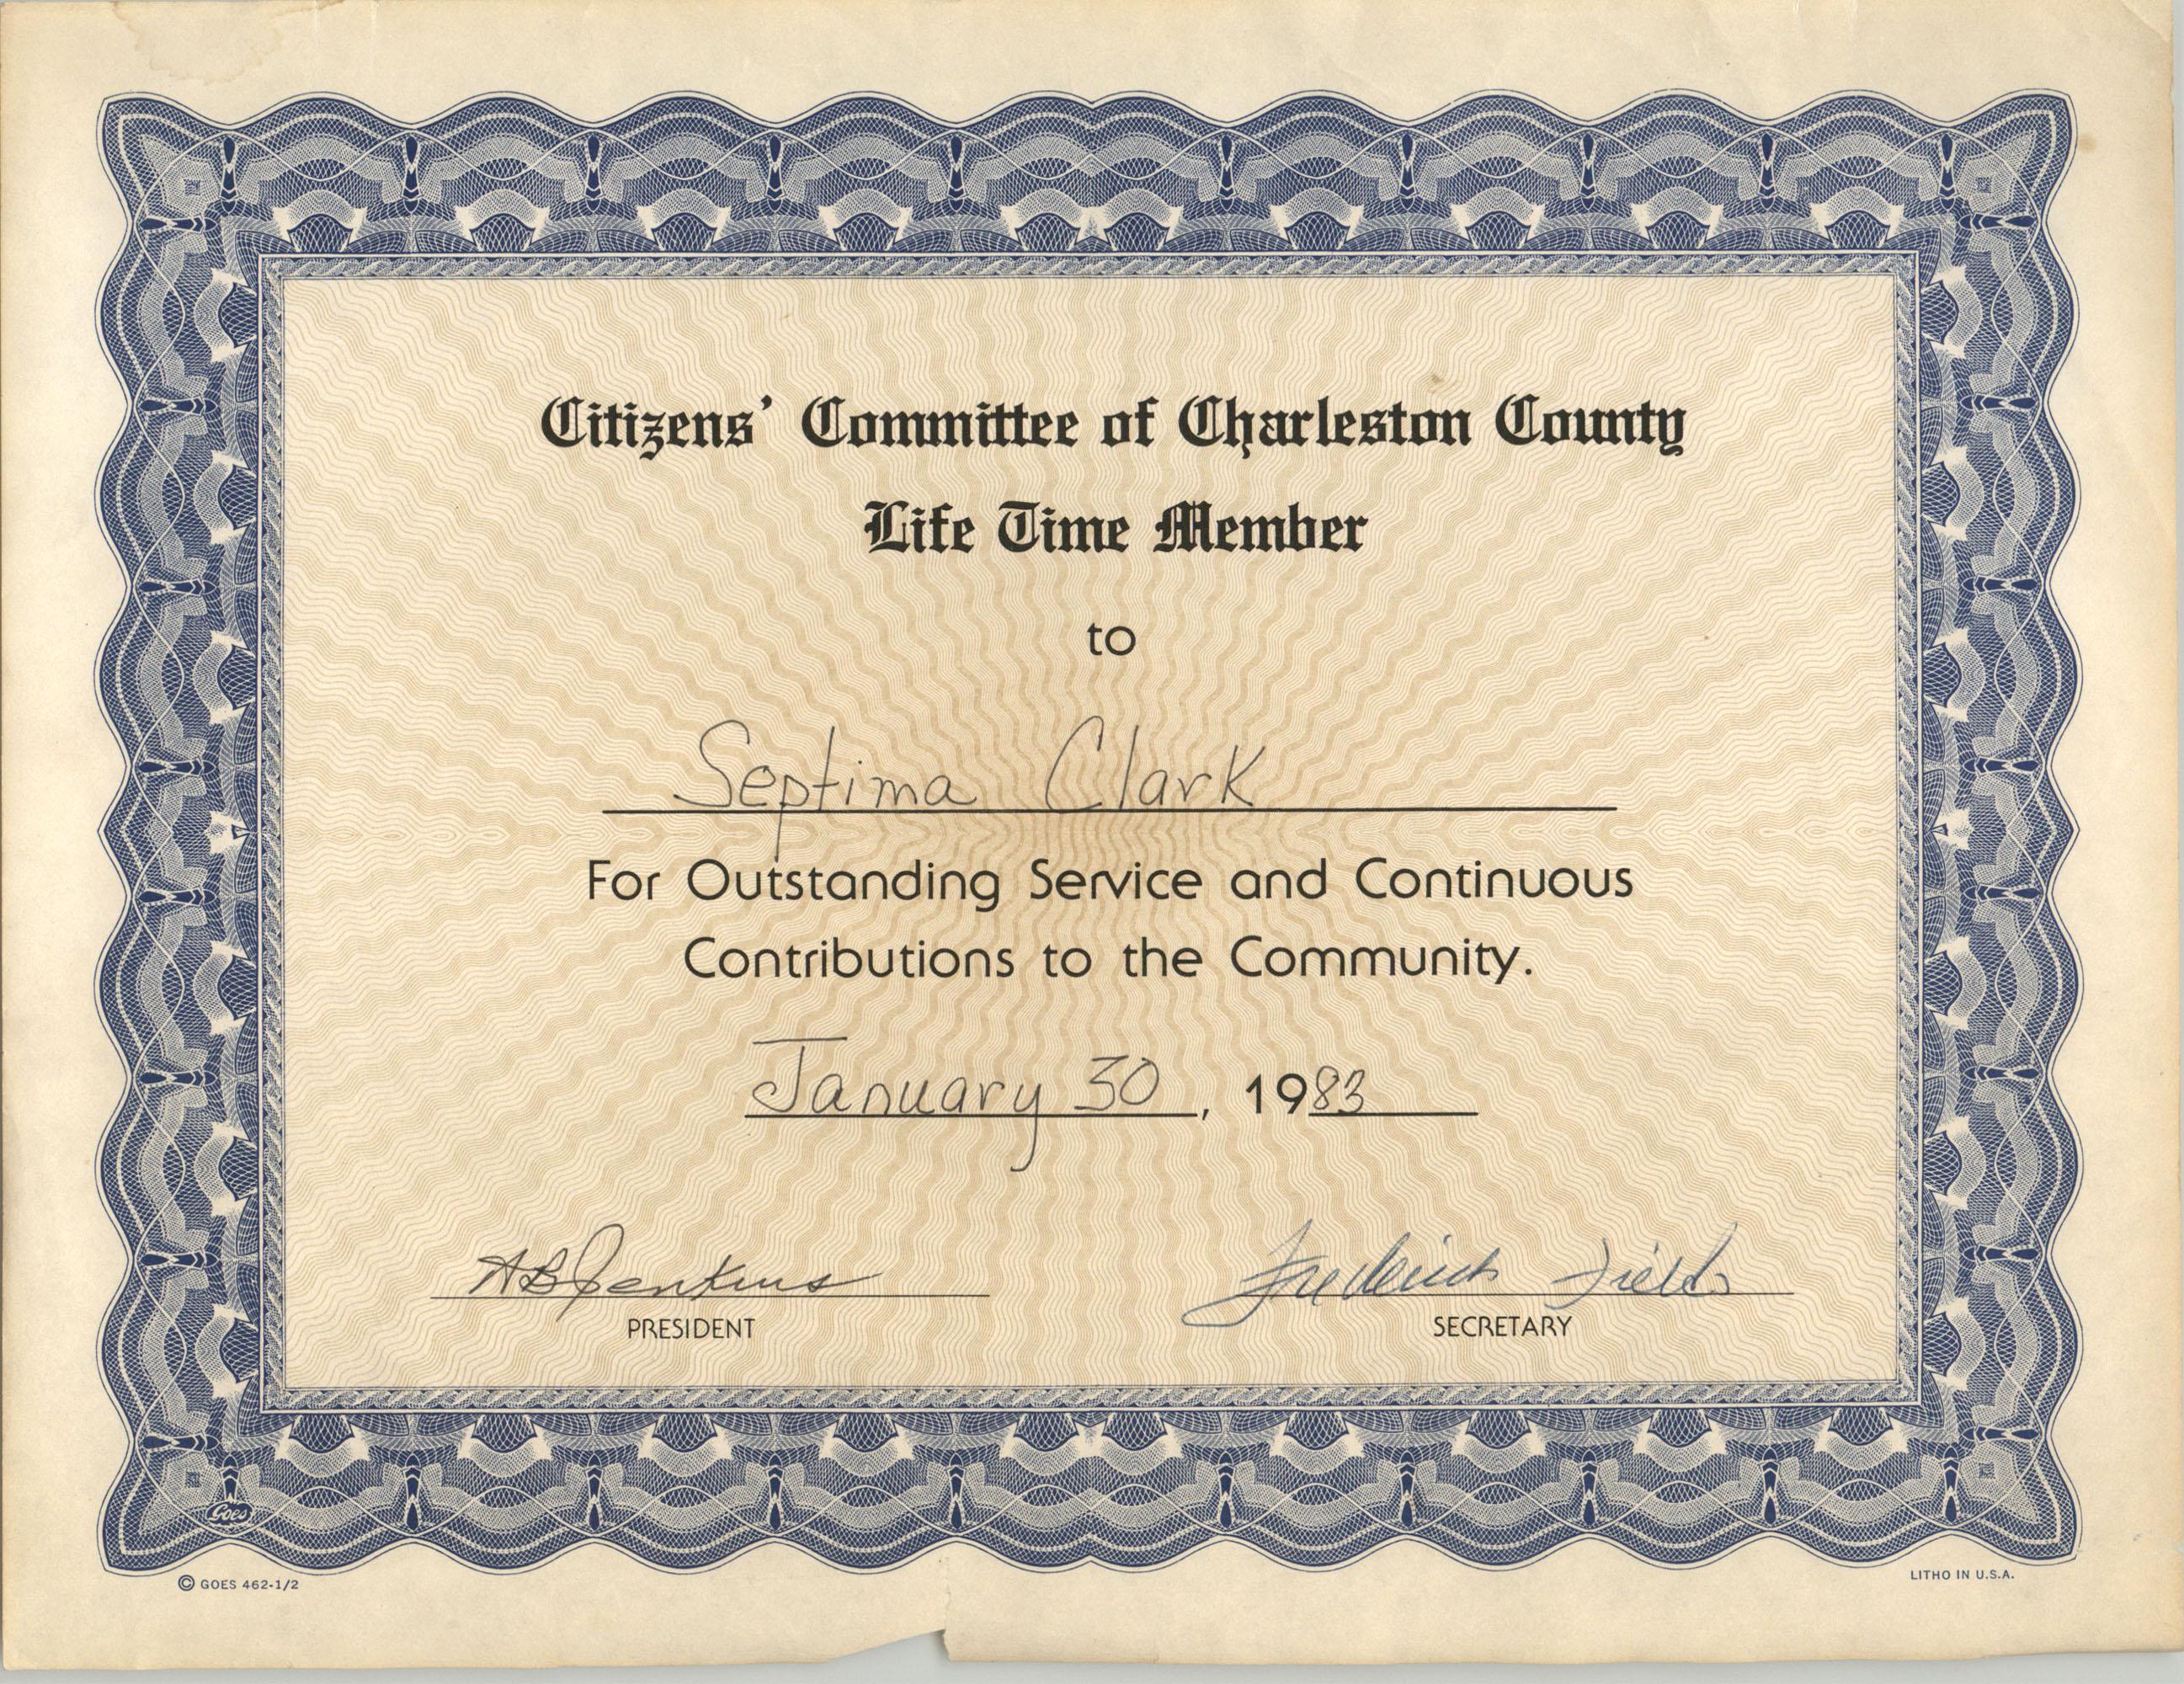 Certificate, January 30, 1983